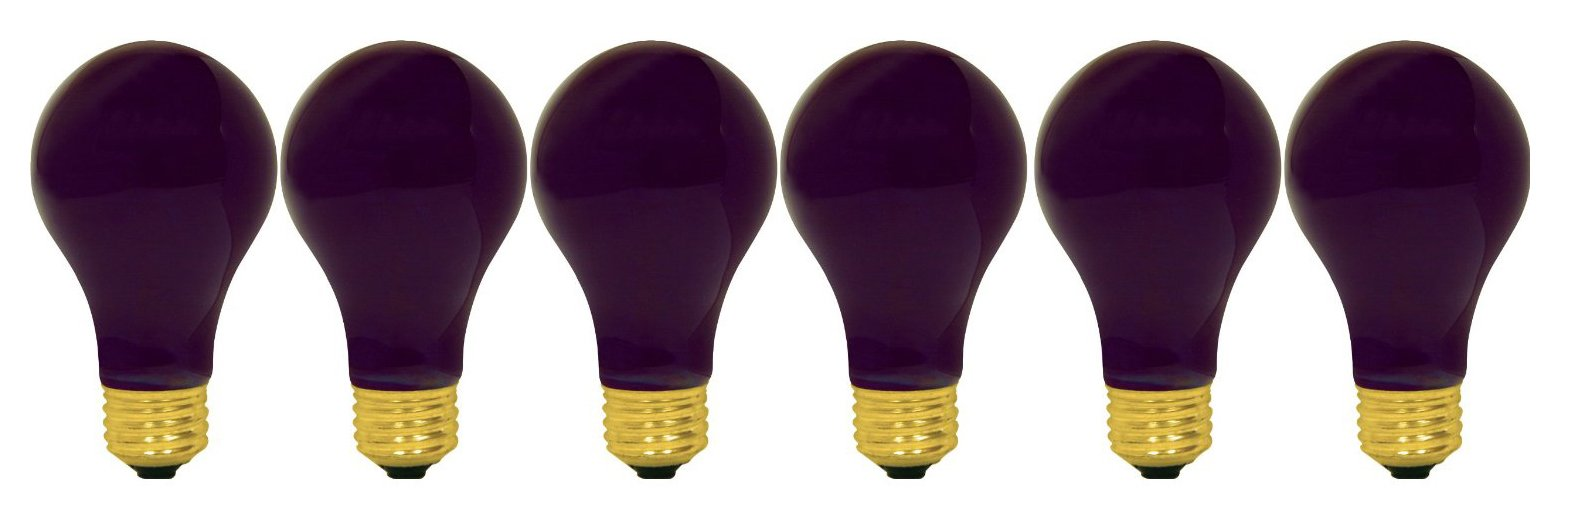 GE Lighting 25905 60-watt A19 Light Bulb with Medium Base, Black, 6-Pack